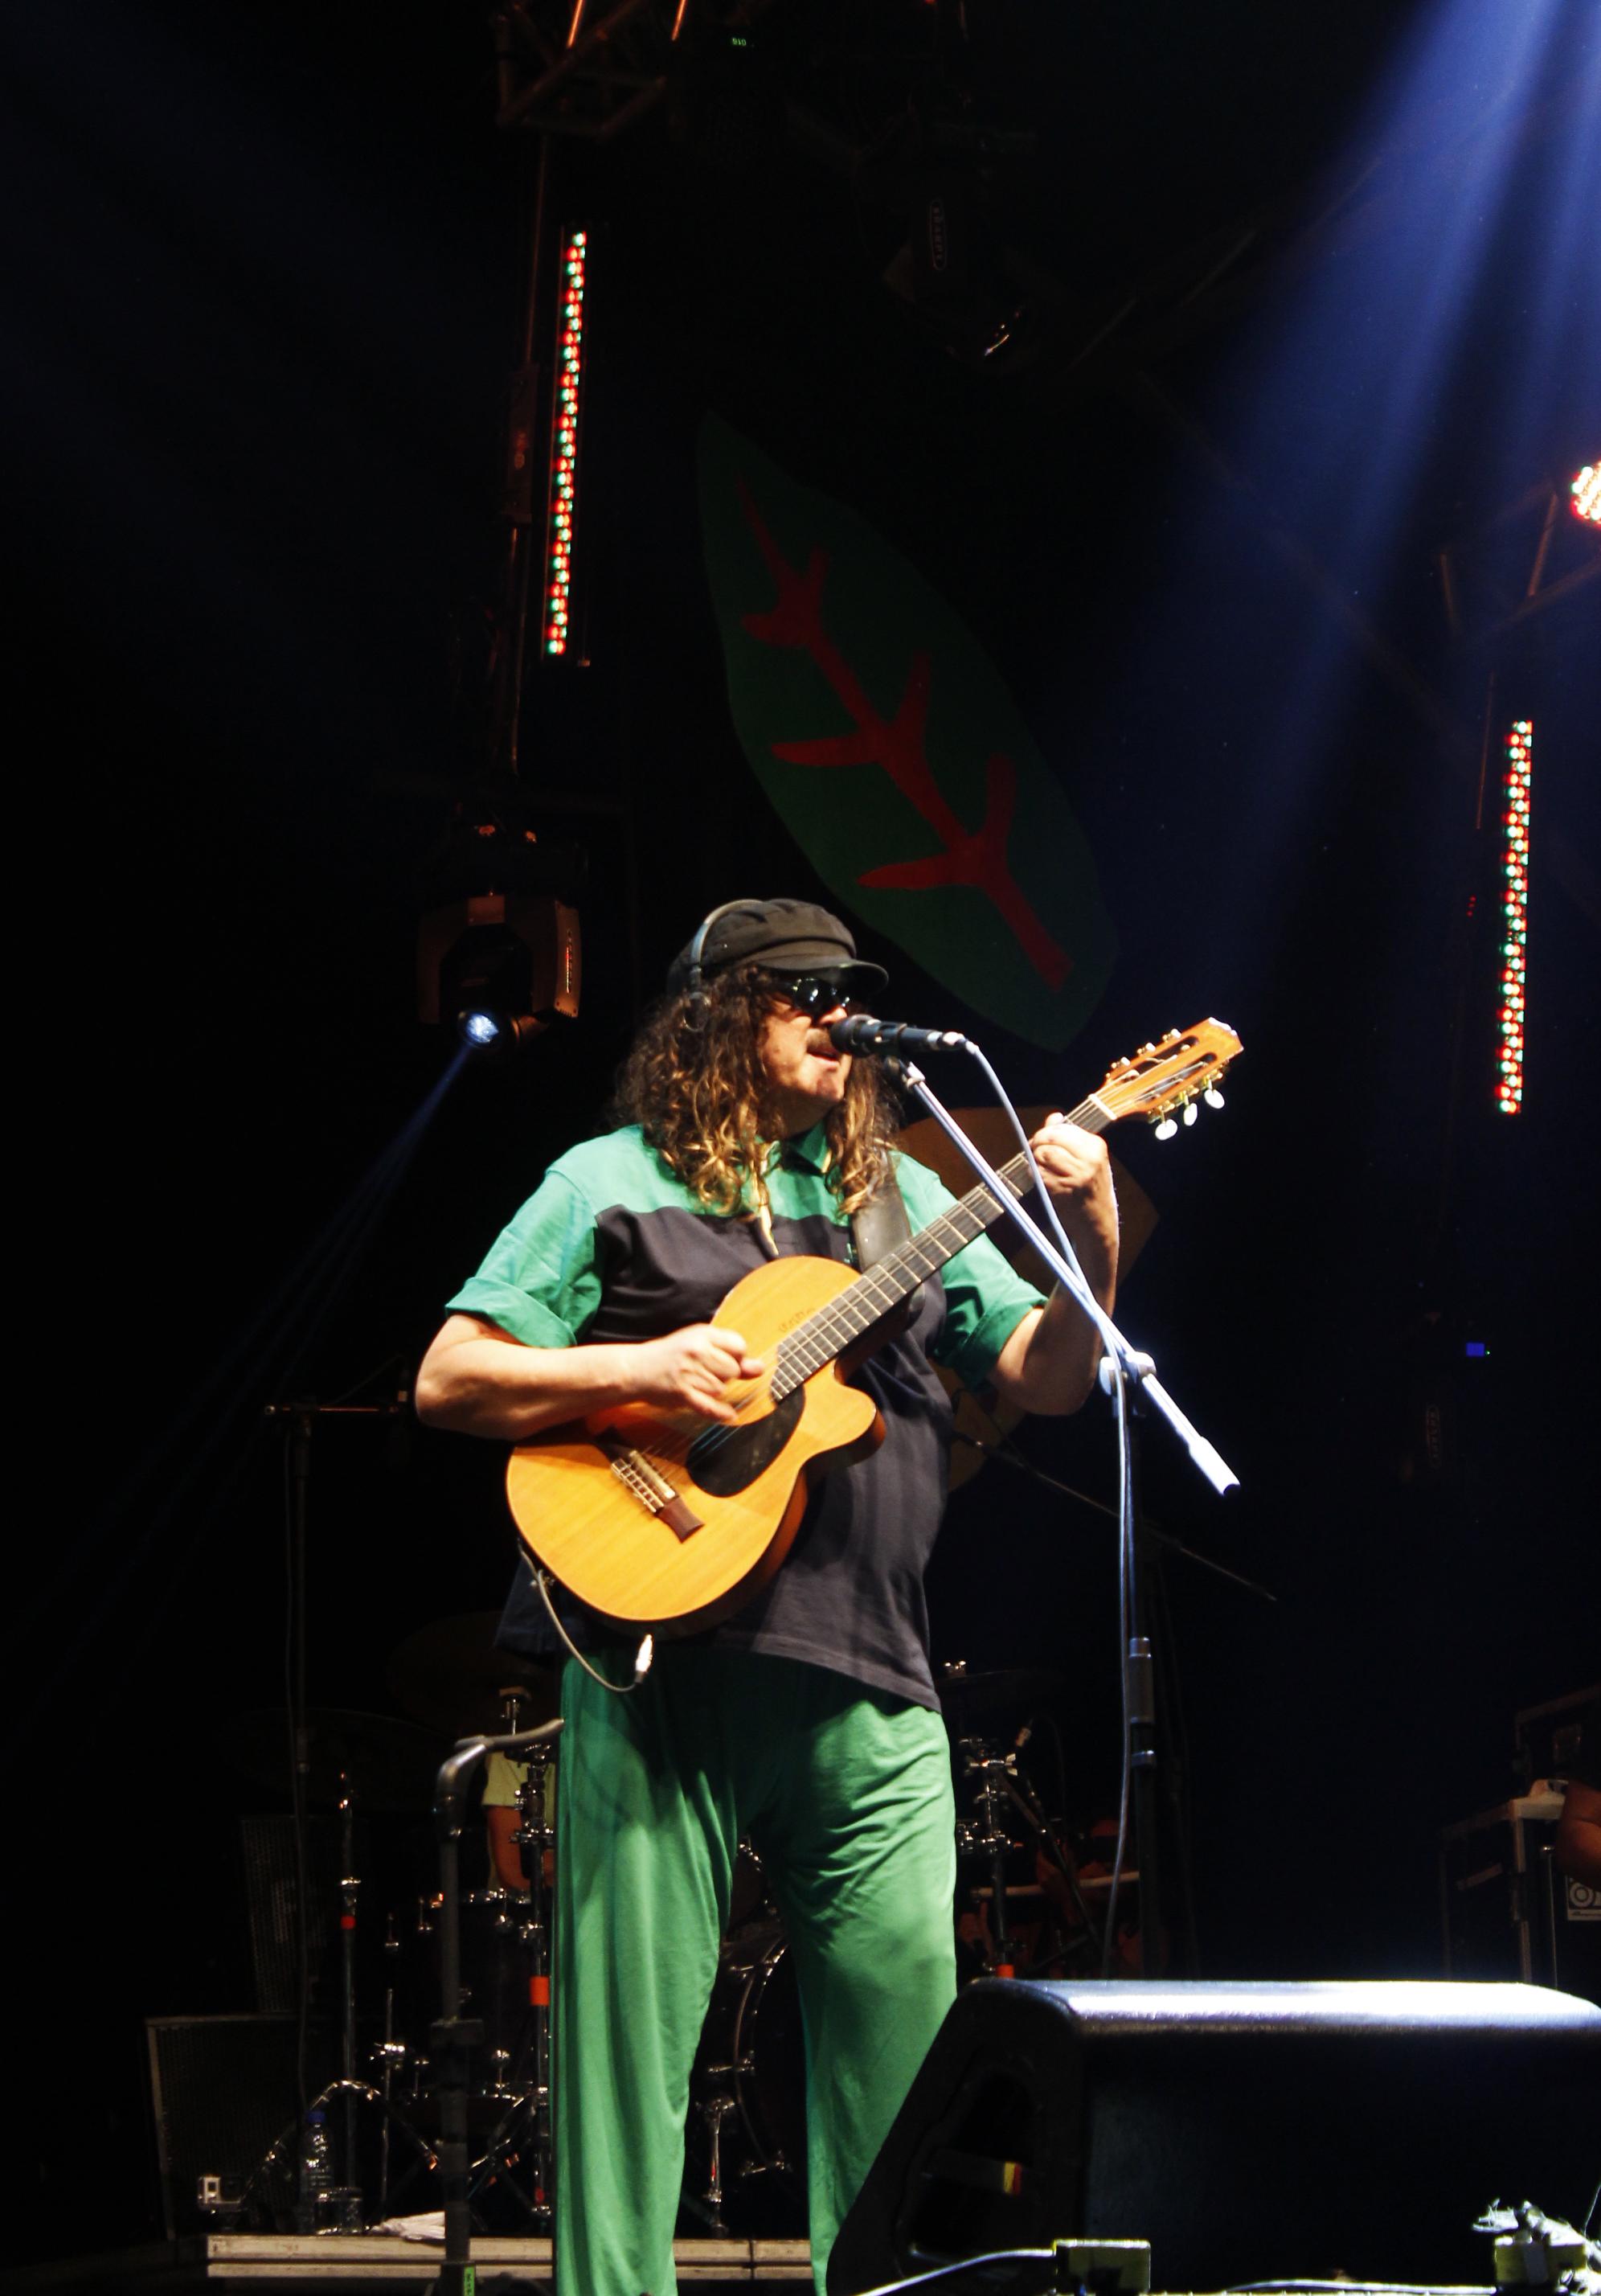 Moraes Moreira, que tocou o álbum Acabou Chorare na íntegra